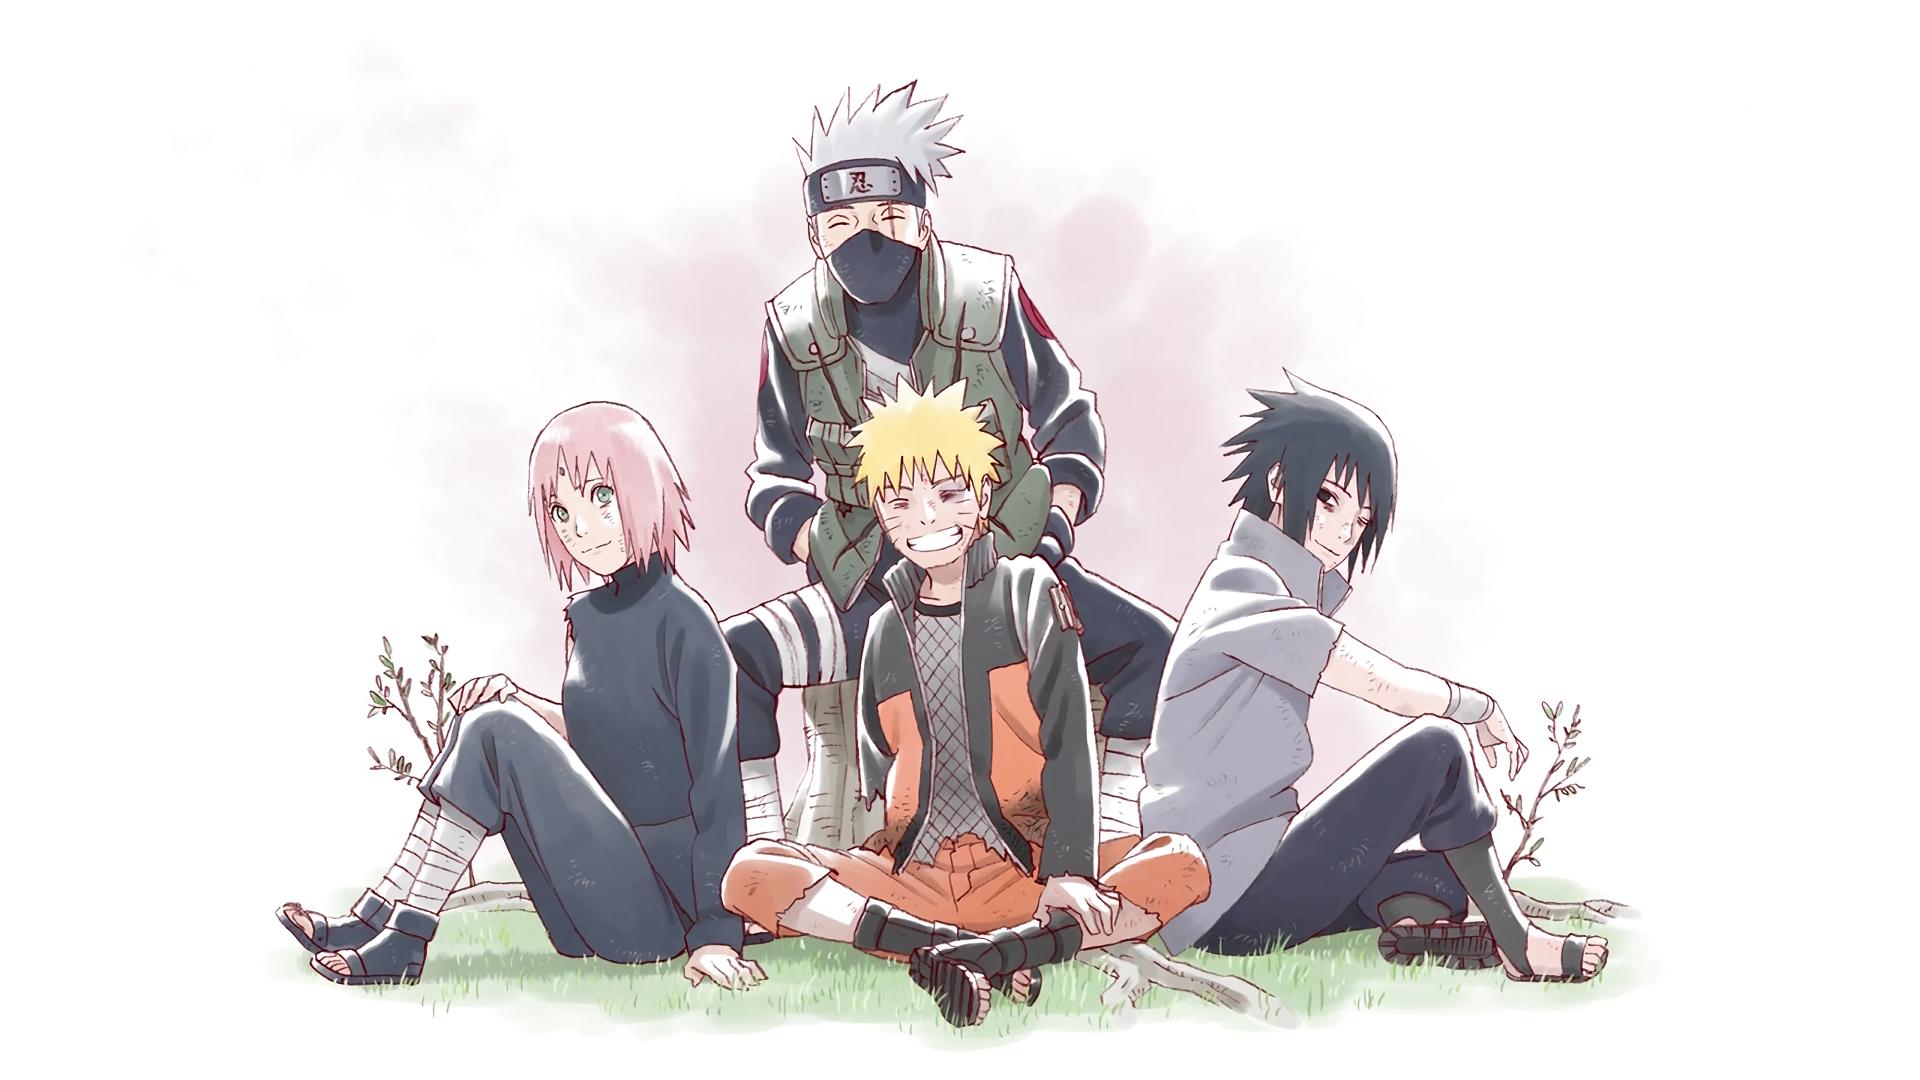 Naruto HD Wallpaper Background Image 1920x1080 ID